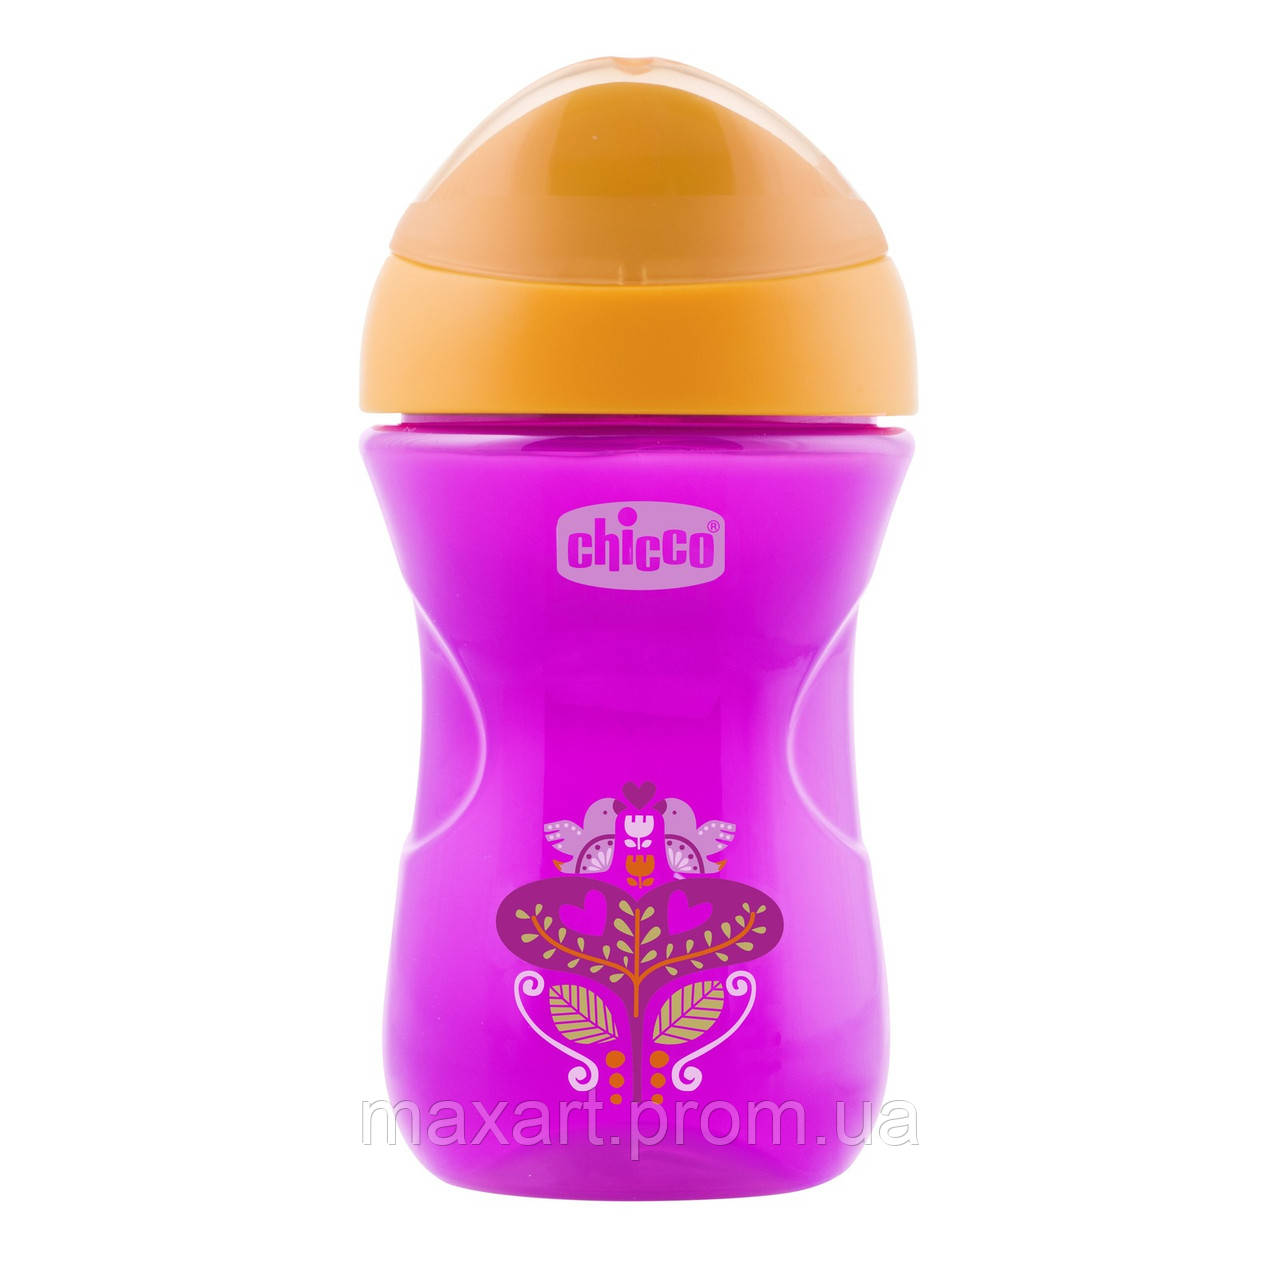 Чашка-непроливайка Chicco - Easy Cup (06961.10V) 266 мл / 12 мес.+ / фиолетовый